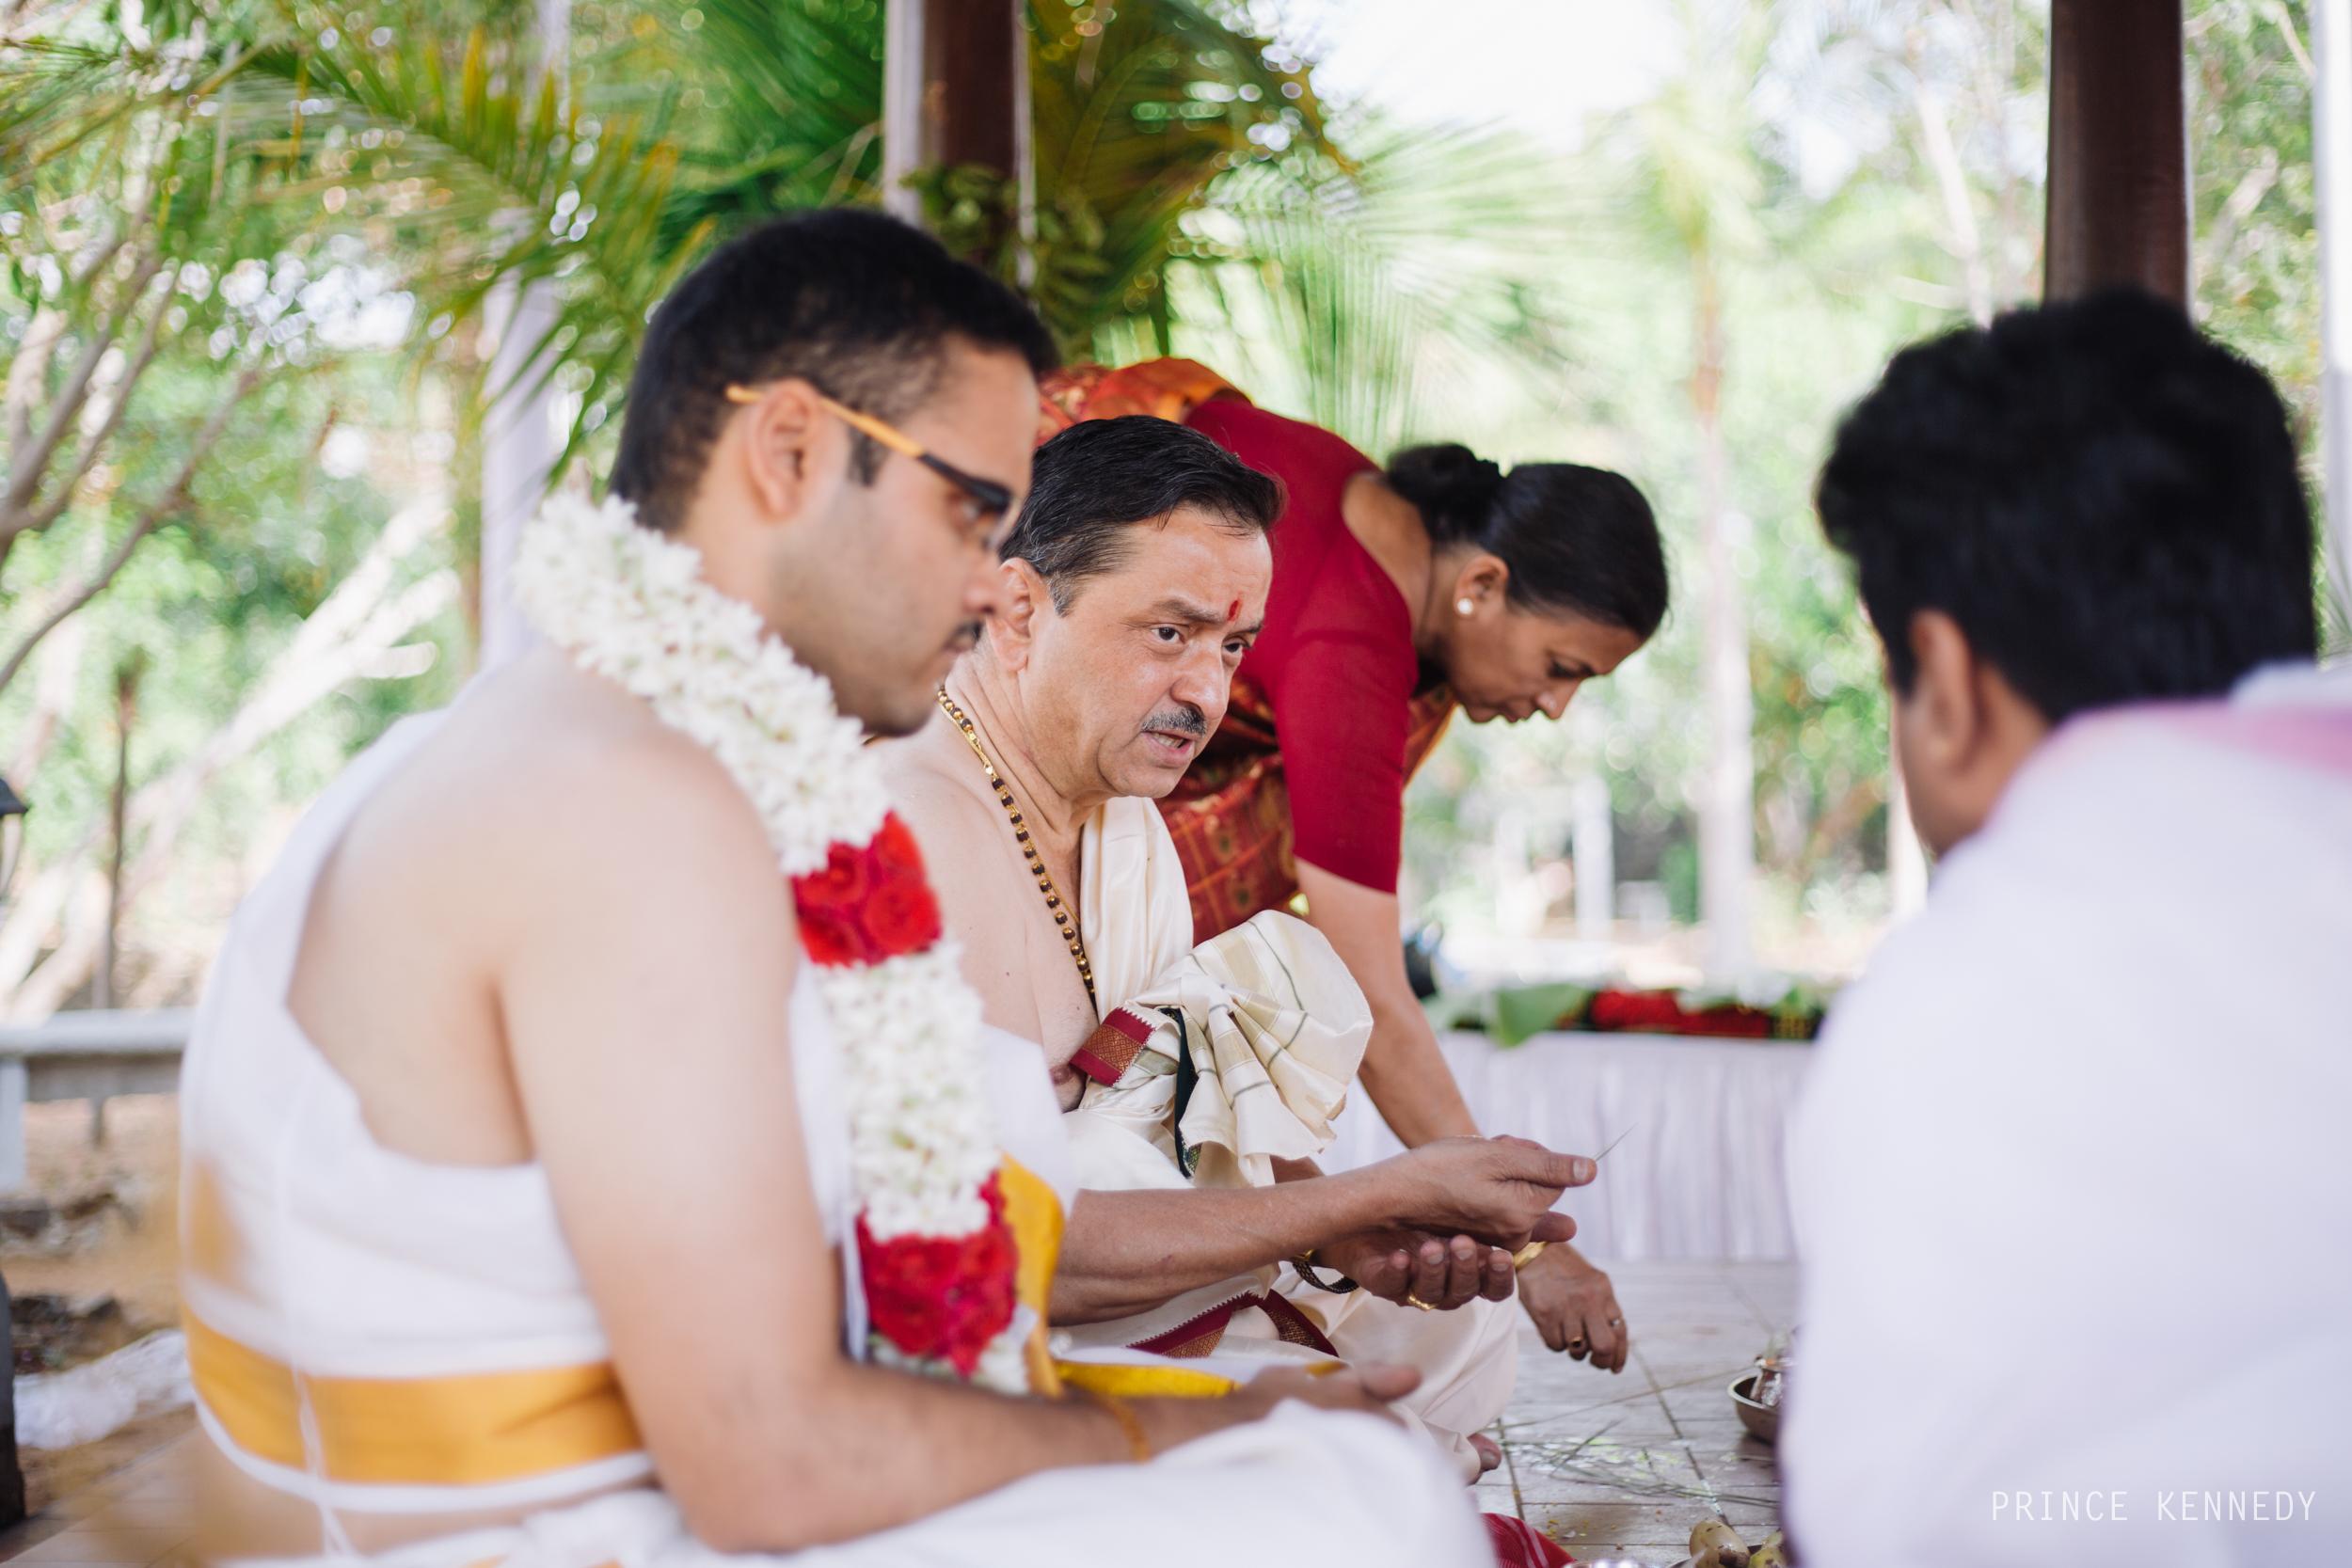 Athmajja-Nithesh-Engagement-Couple-Portrait-Portraiture-Wedding-Couple-Portrait-Chennai-Photographer-Candid-Photography-Destination-Best-Prince-Kennedy-Photography-53.jpg